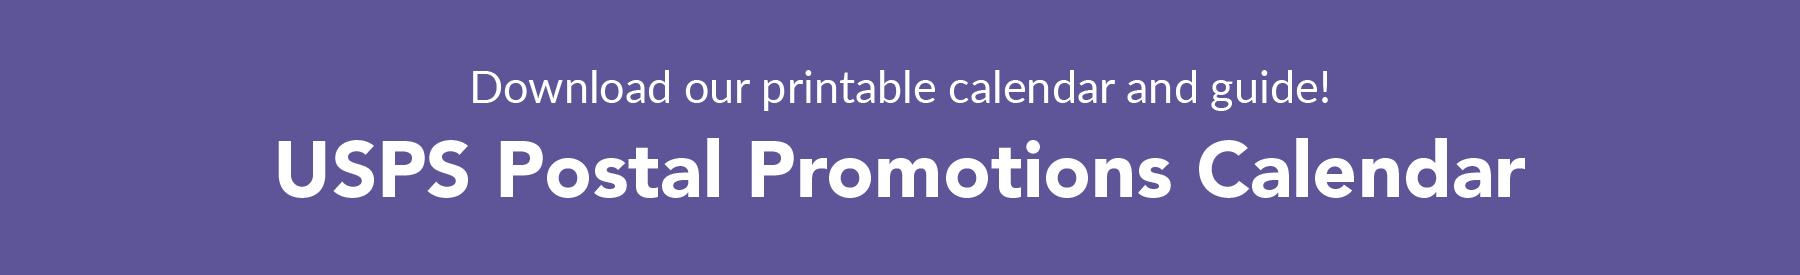 Download our USPS Postal Promotions Calendar